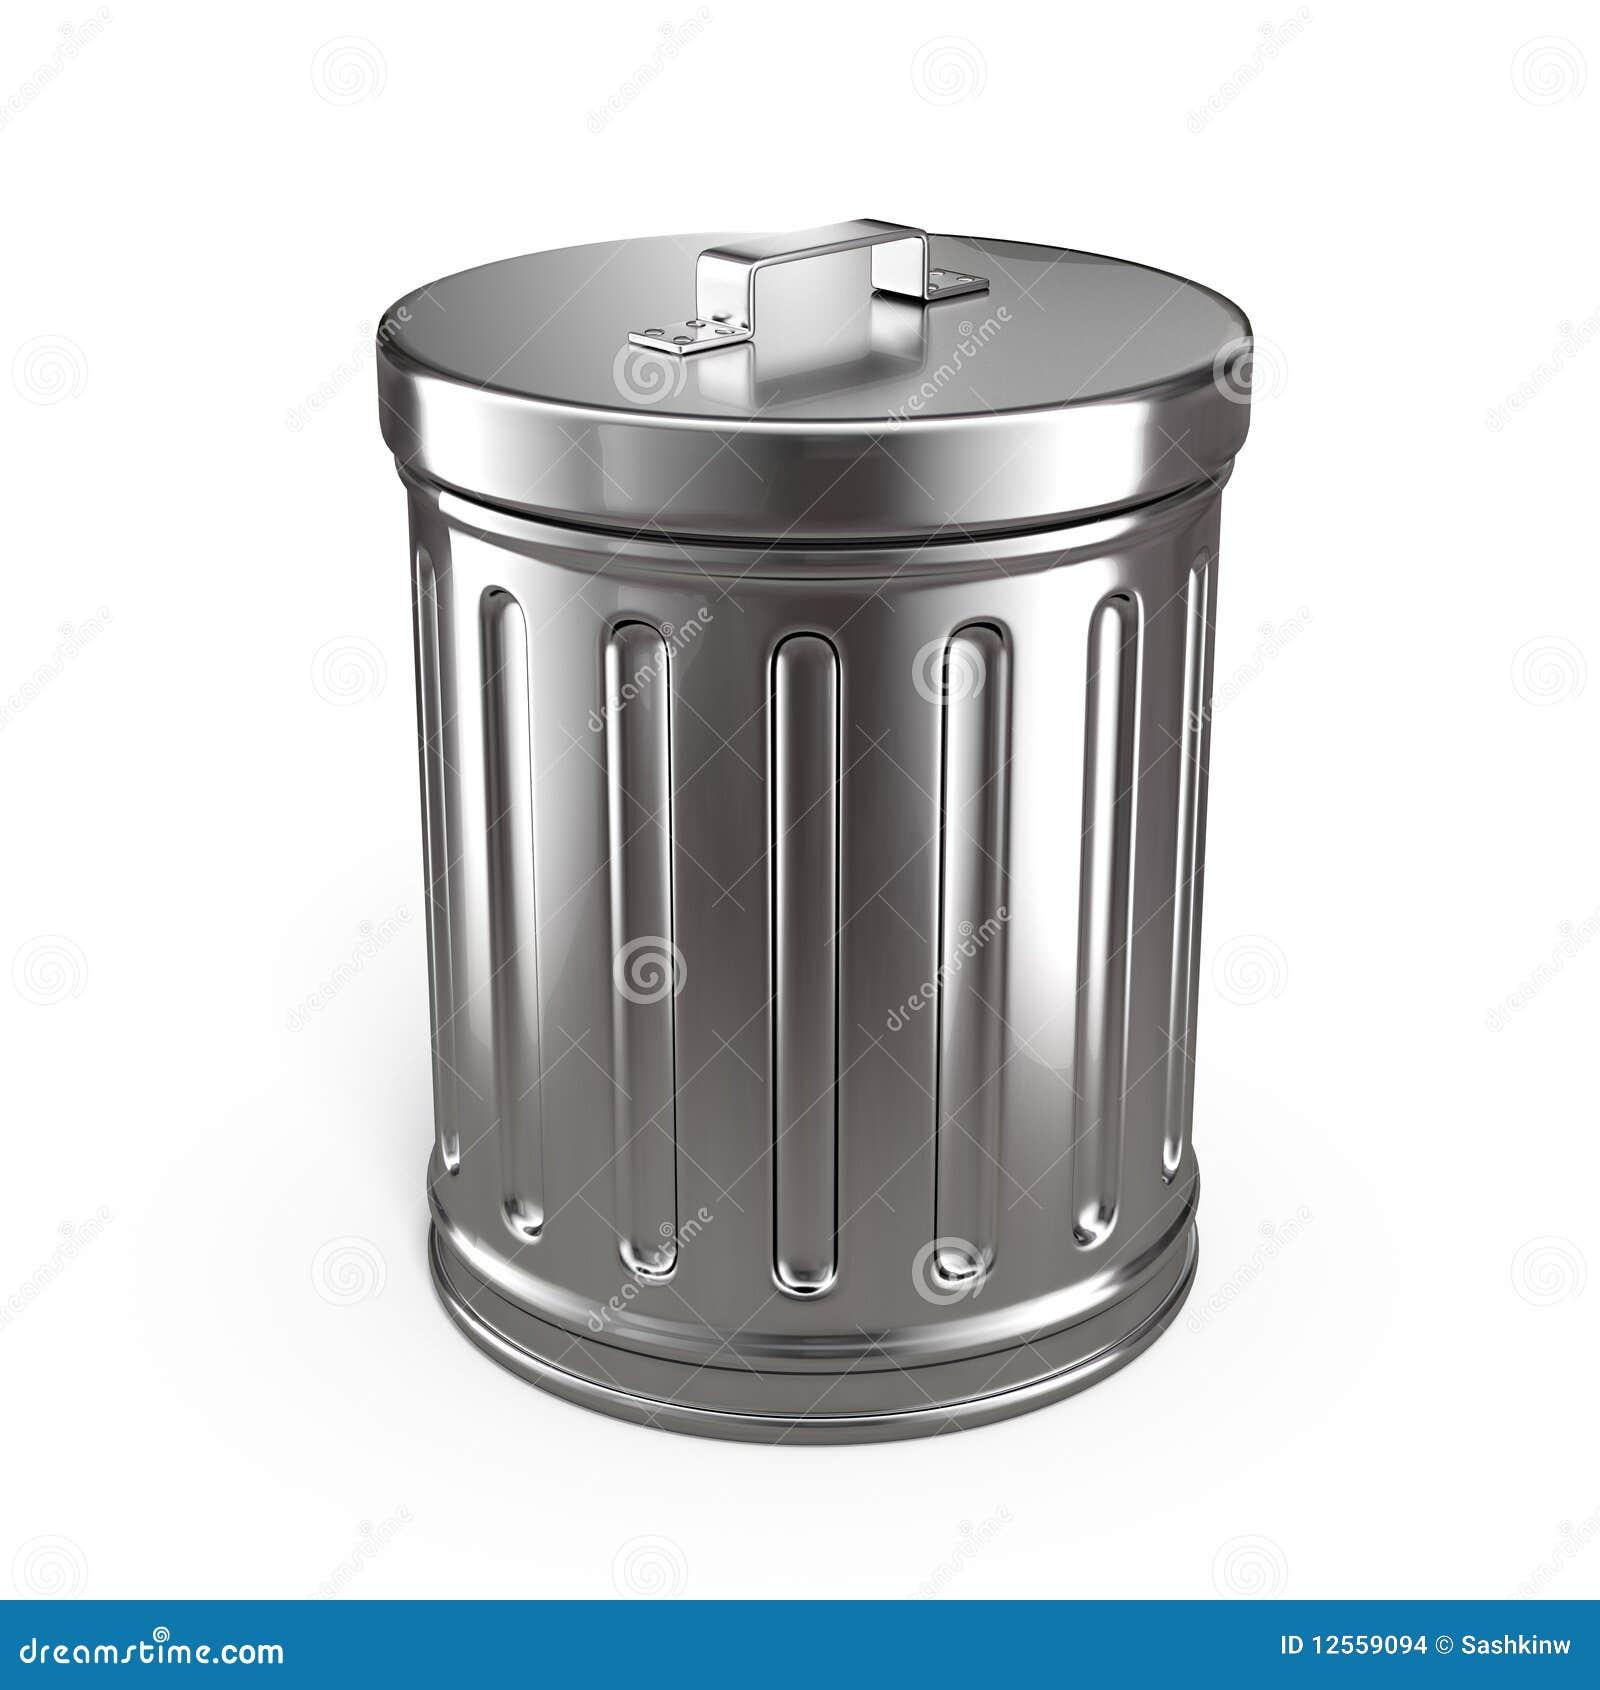 Closed trash can stock illustration. Illustration of rubbish - 12559094 67a72cf3bf01